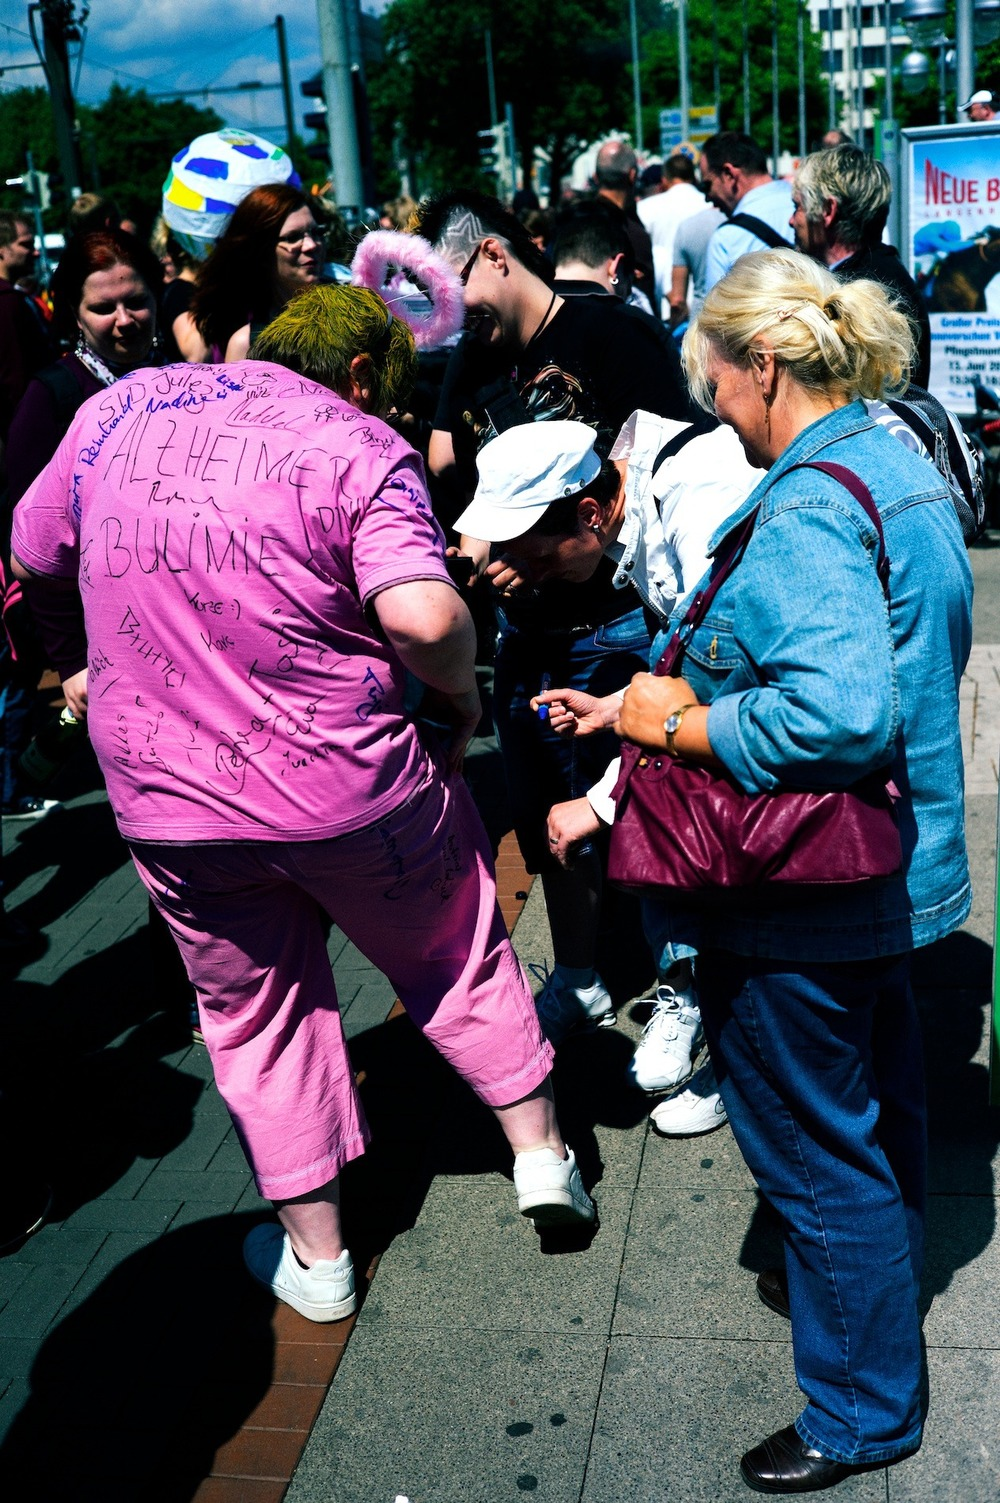 2011-06-11 at 13-33-51, street.jpg